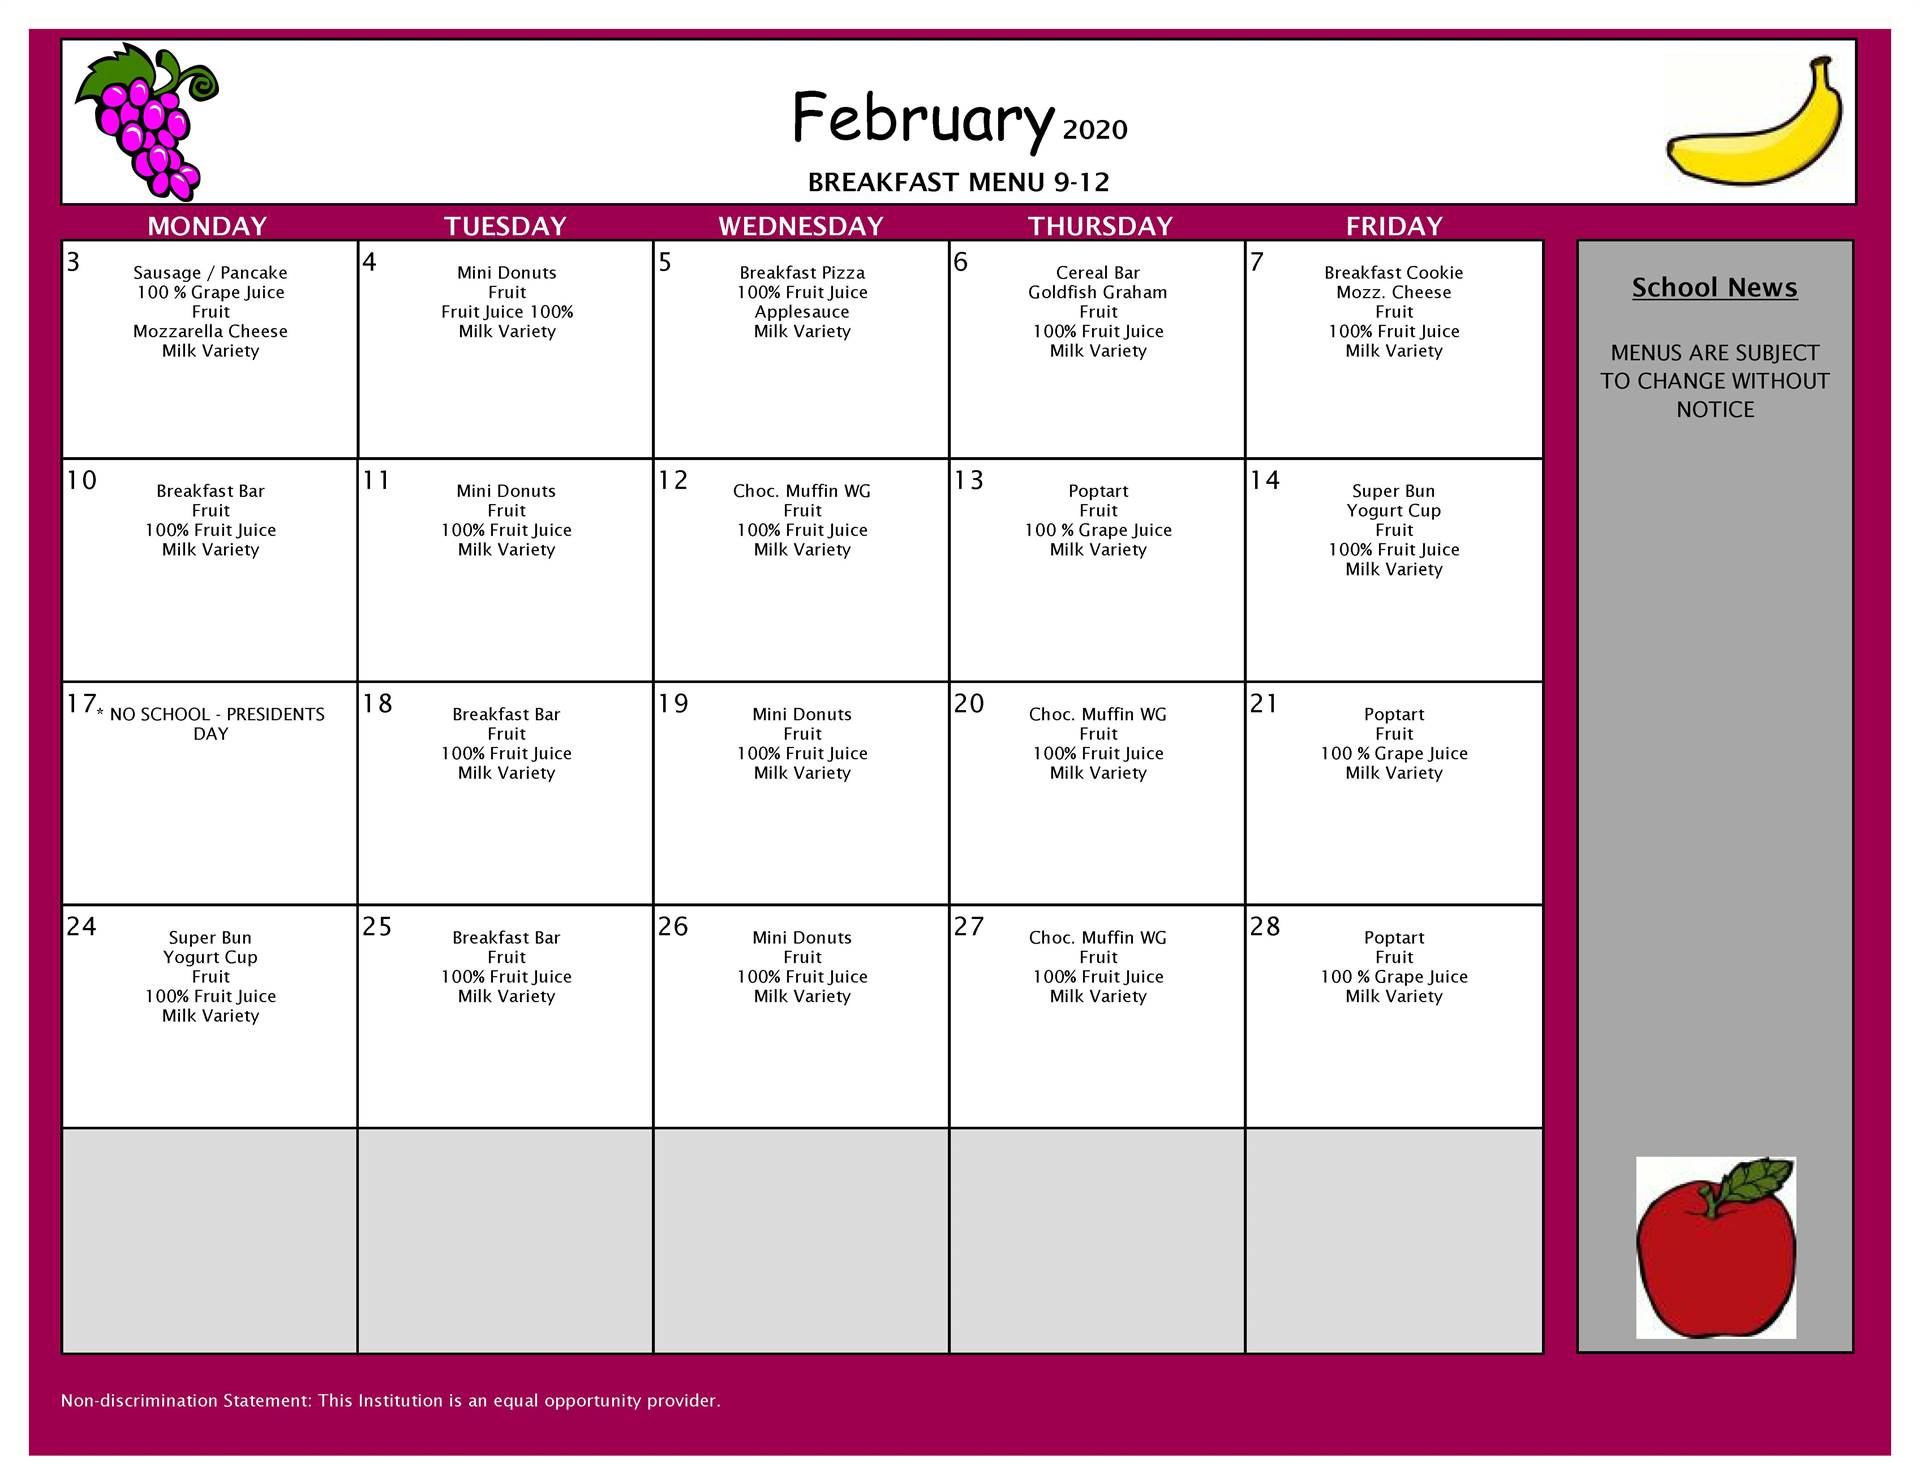 February Breakfast Grades 9-12